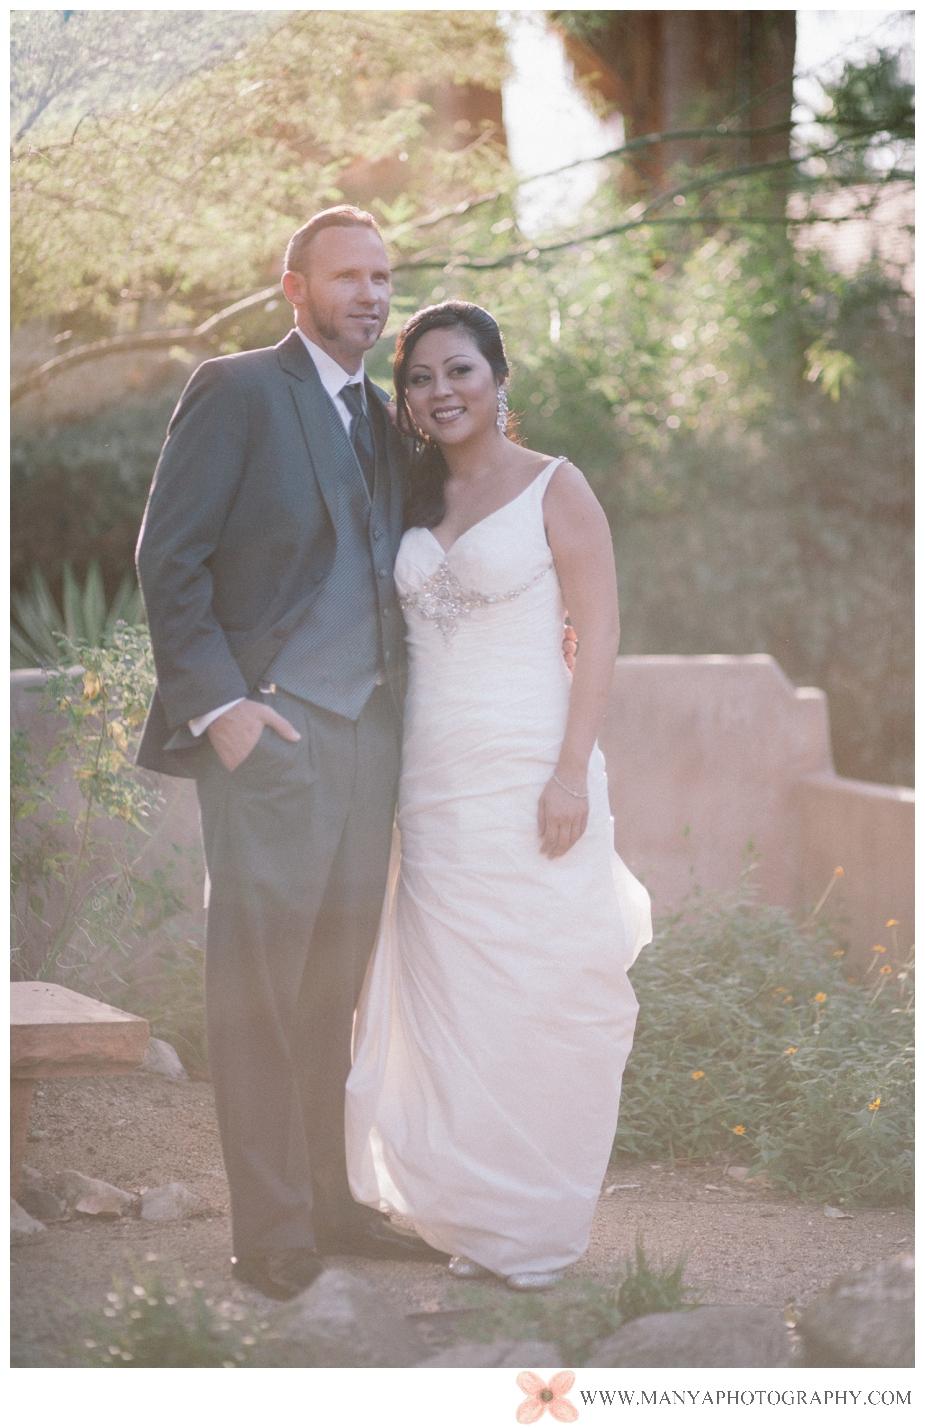 2013-07-28_0028 - Orange County Wedding Photographer